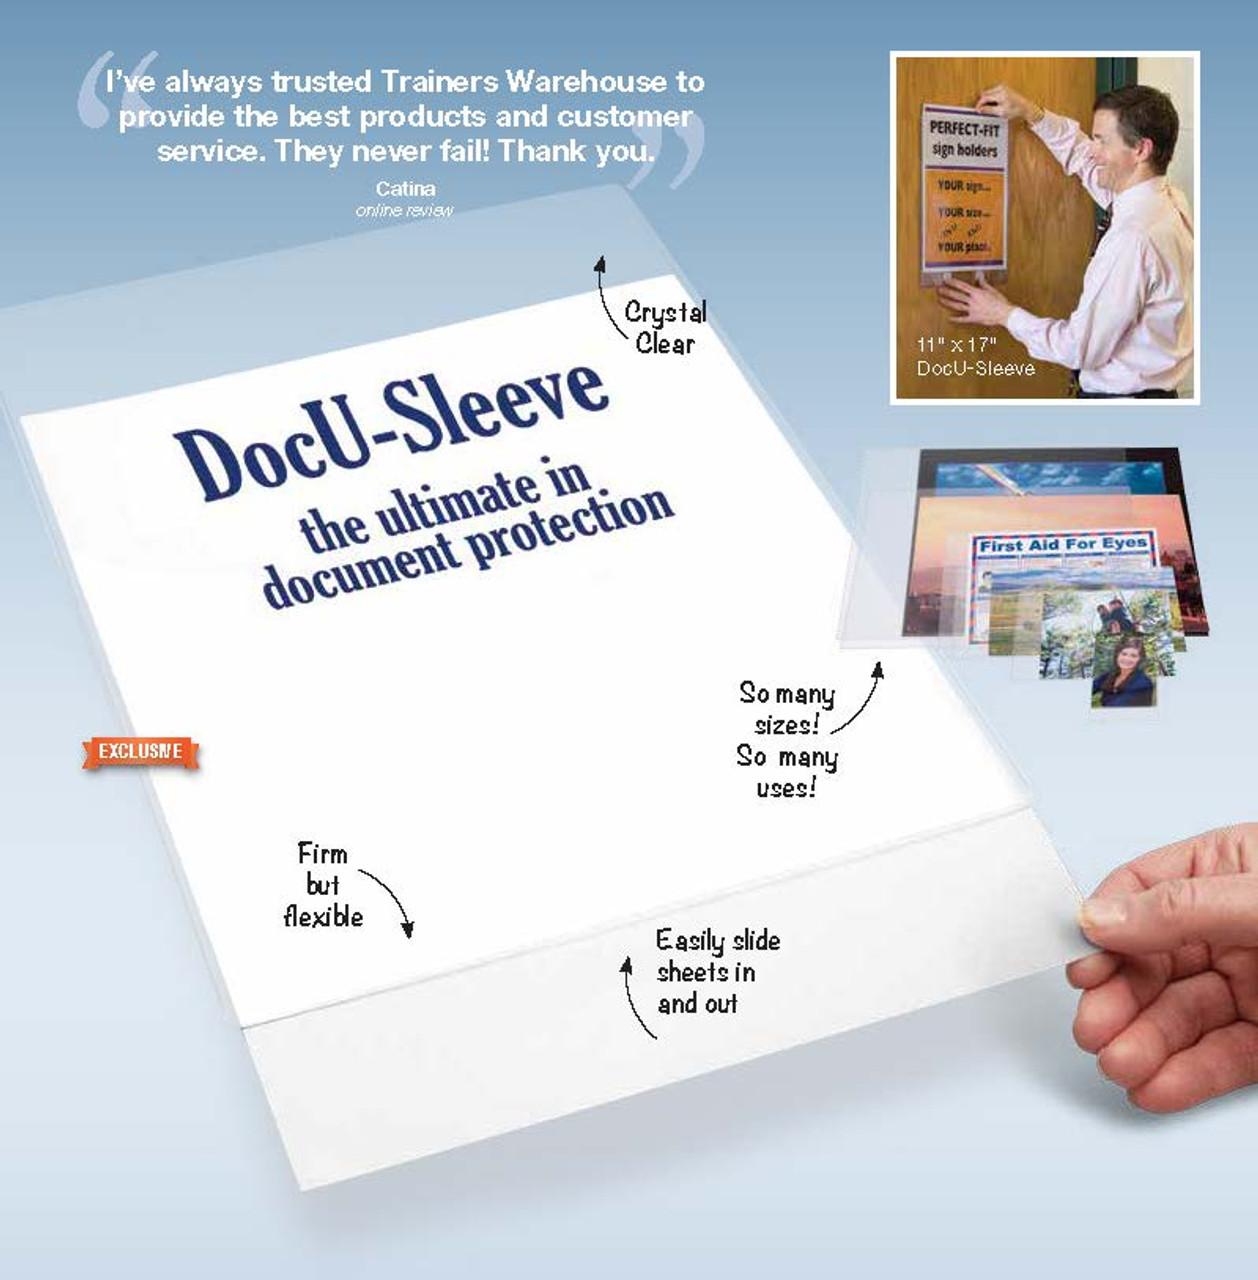 DocU-Sleeve - features